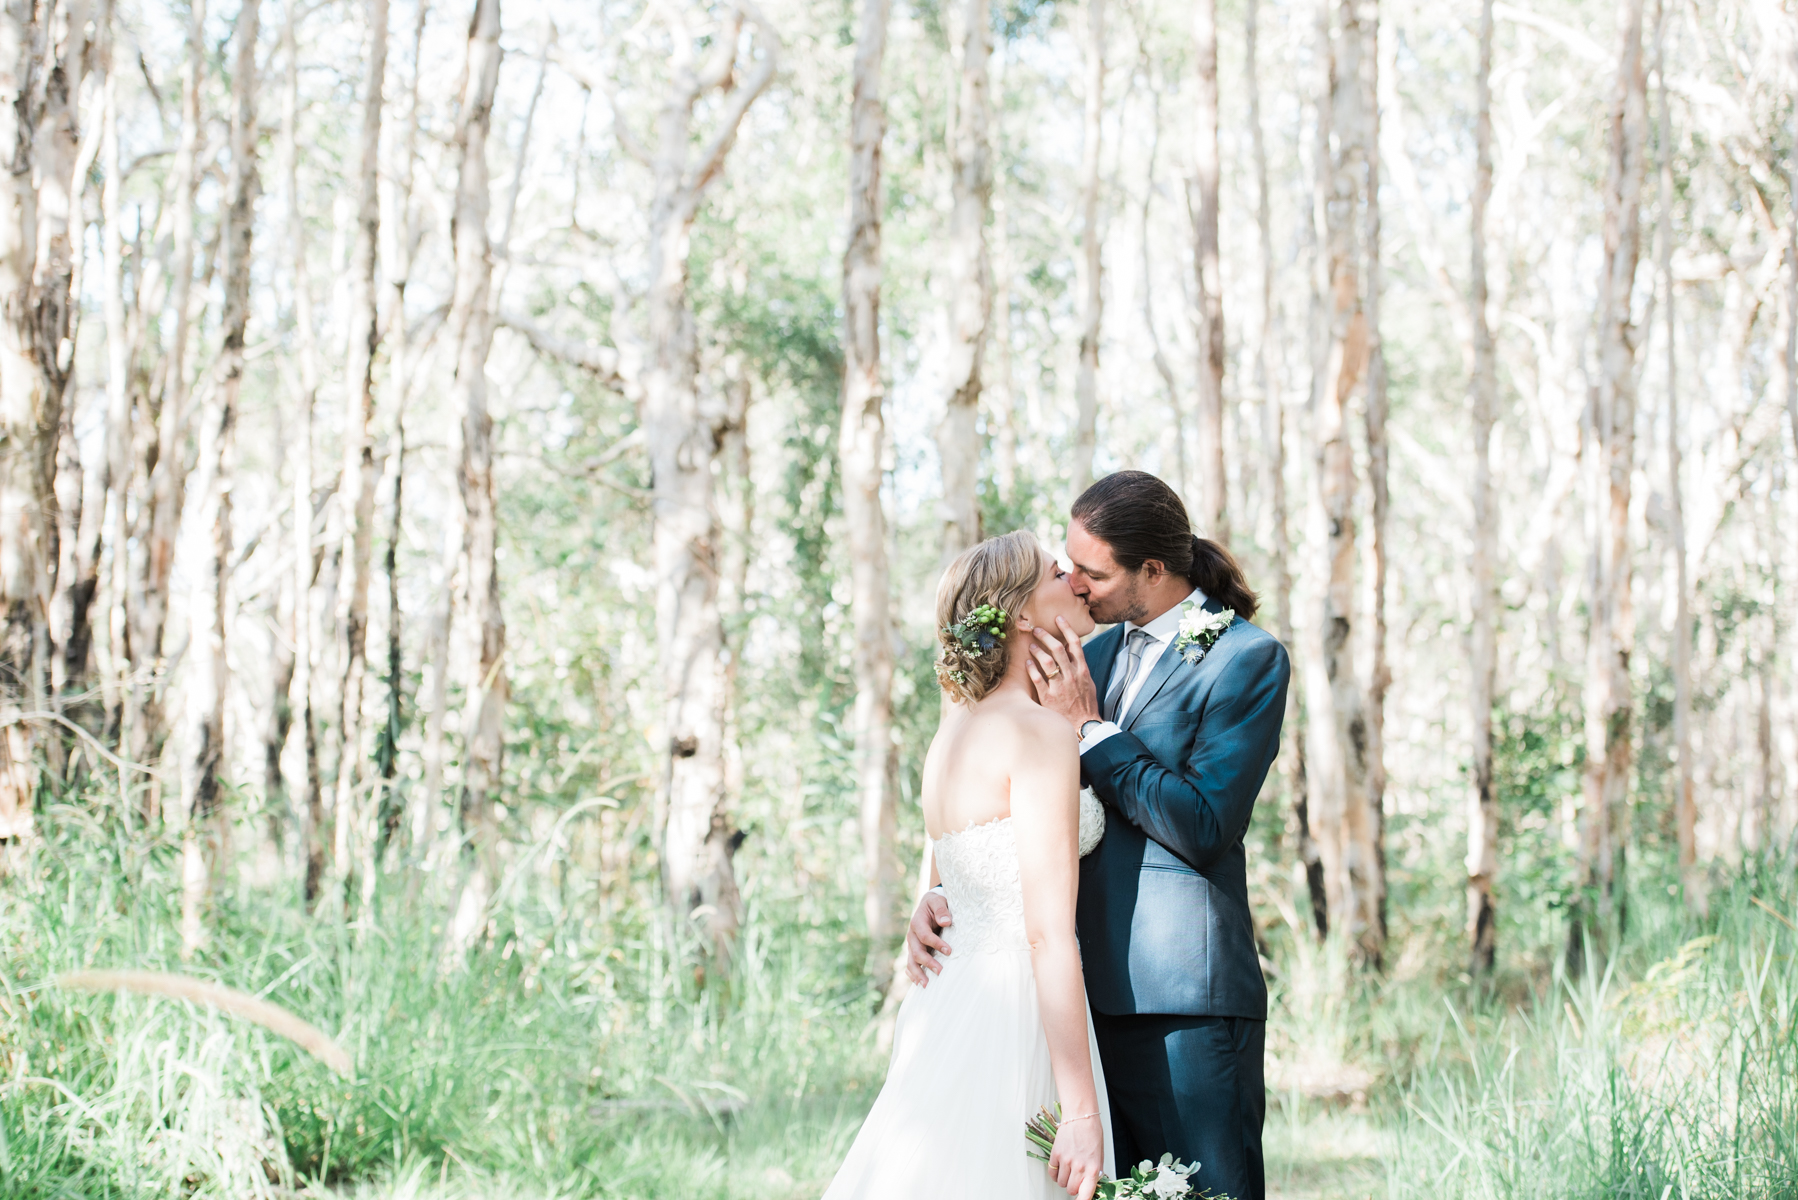 Cass and Josh- wedding photographer, byron bay wedding and family photographer, tweed heads wedding and family photography-530.jpg